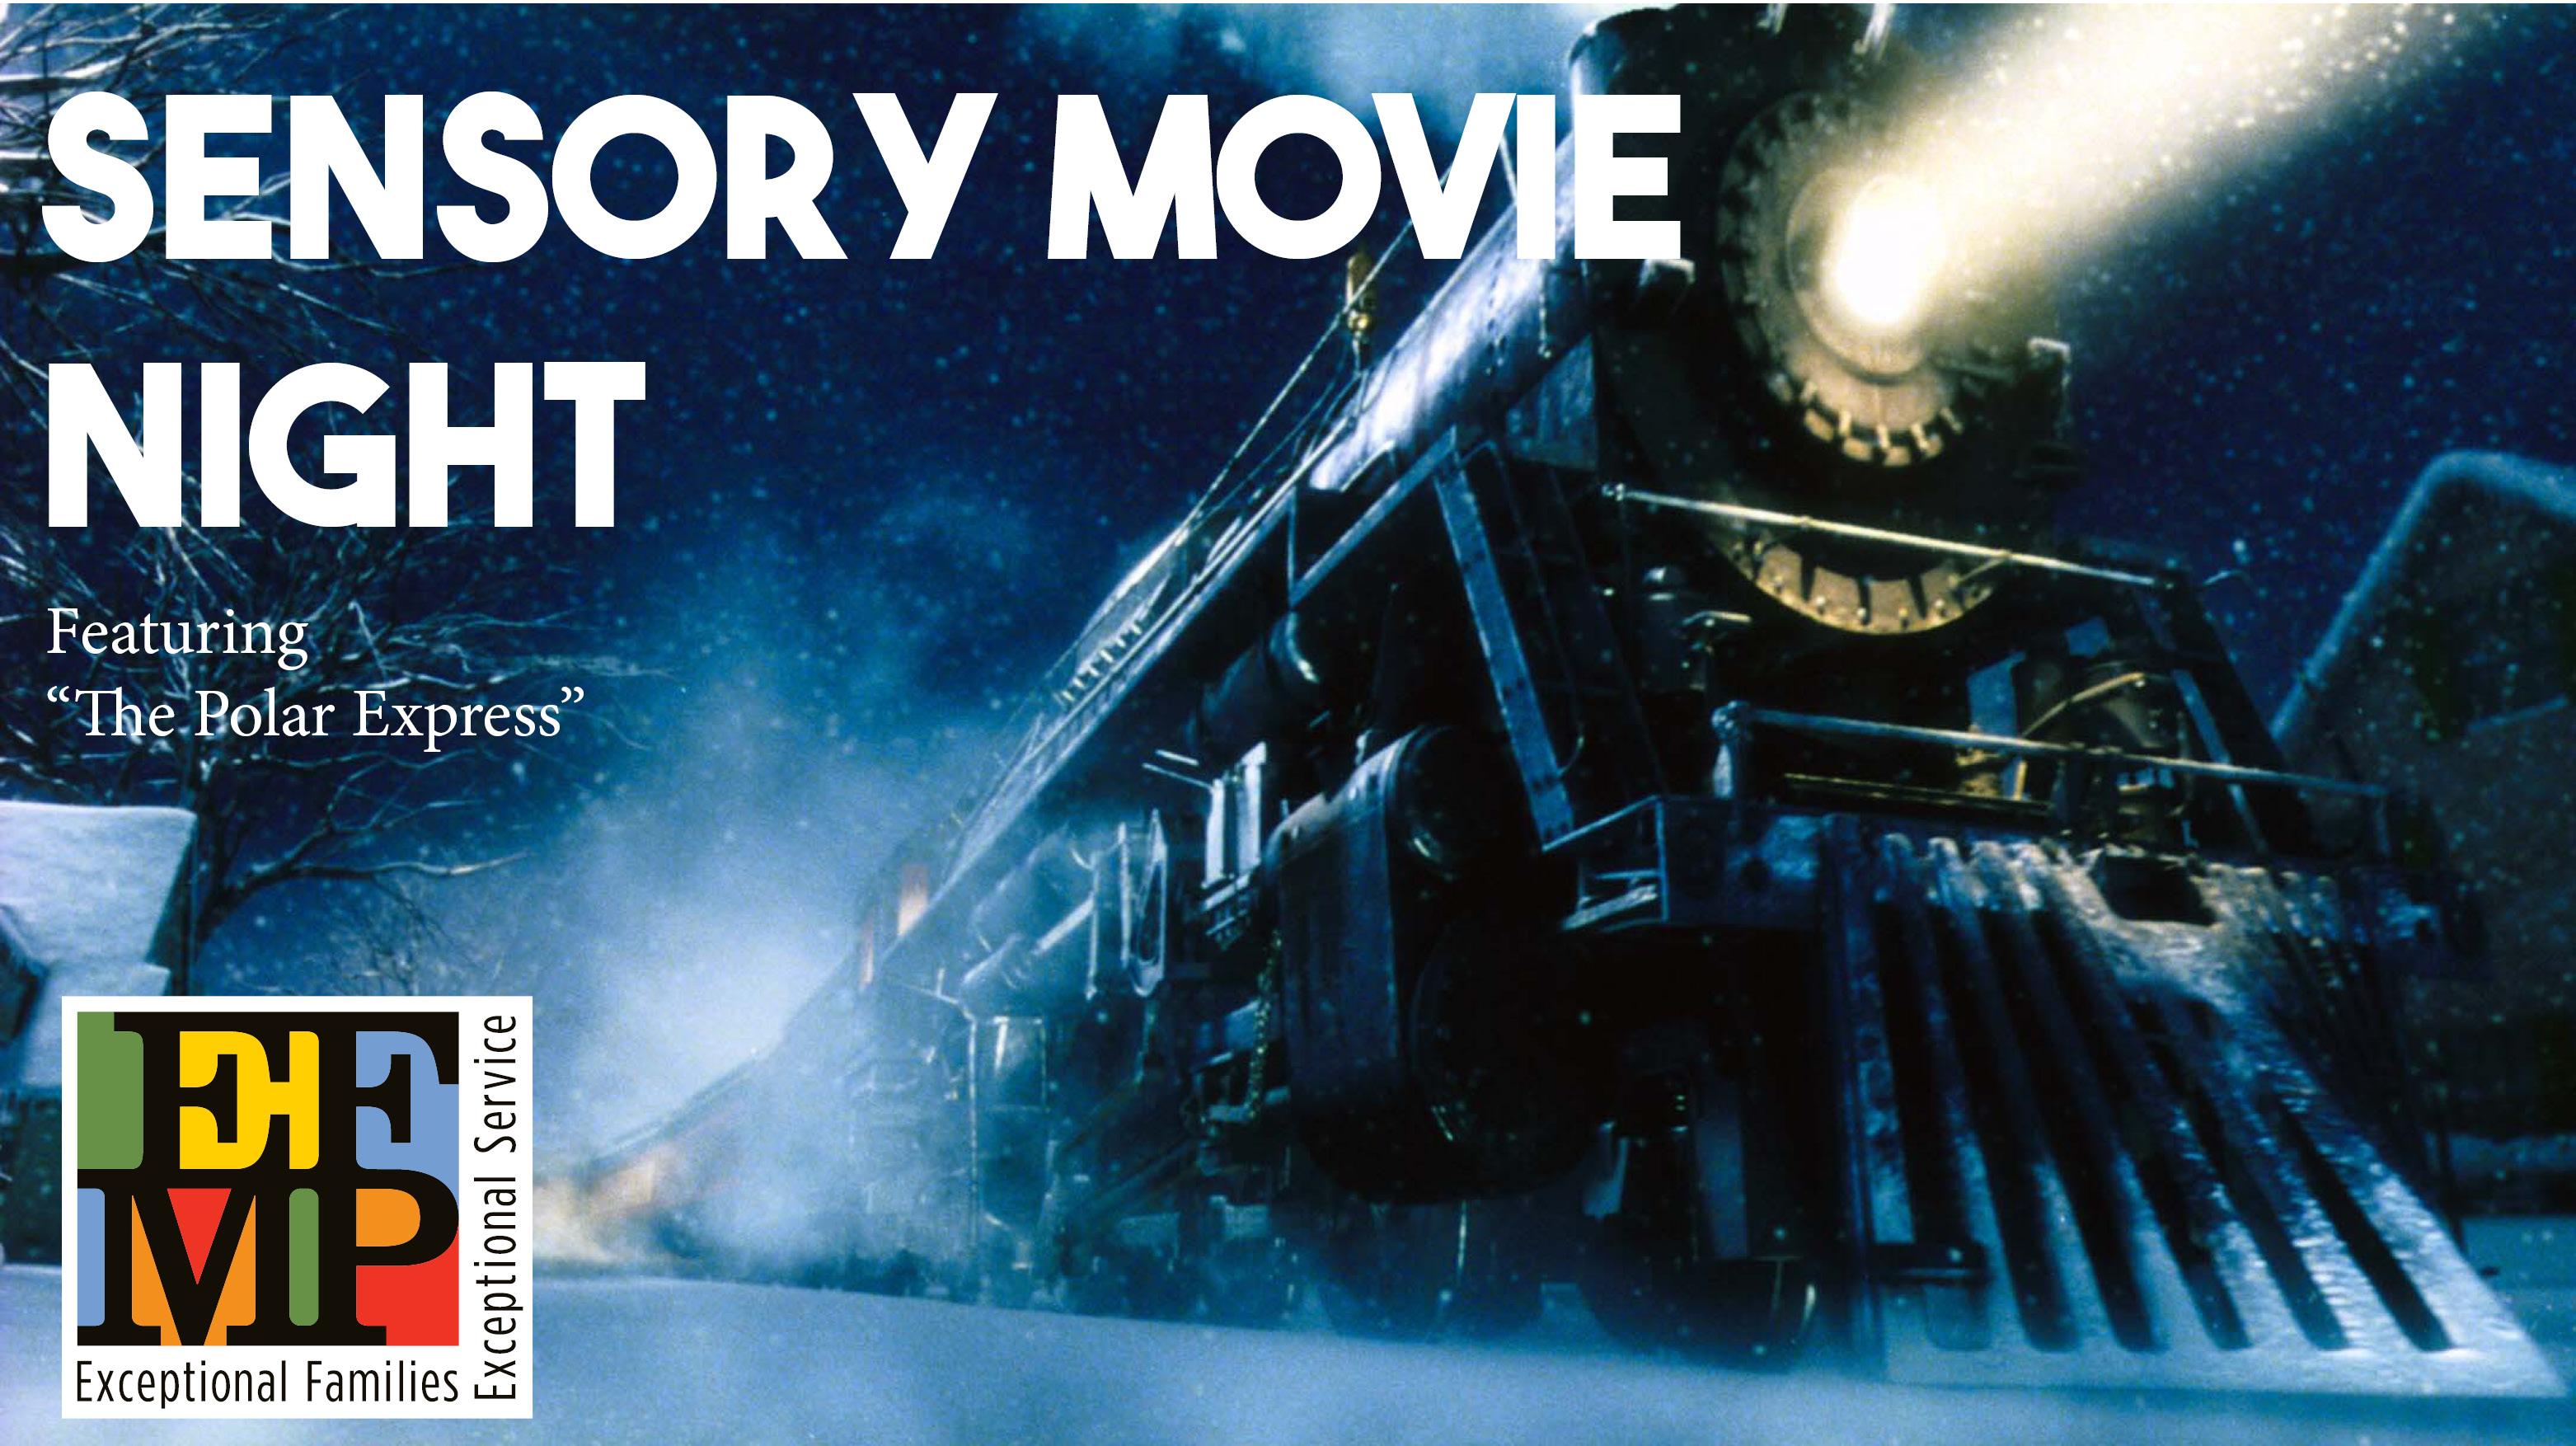 EFMP Sensory Movie Night